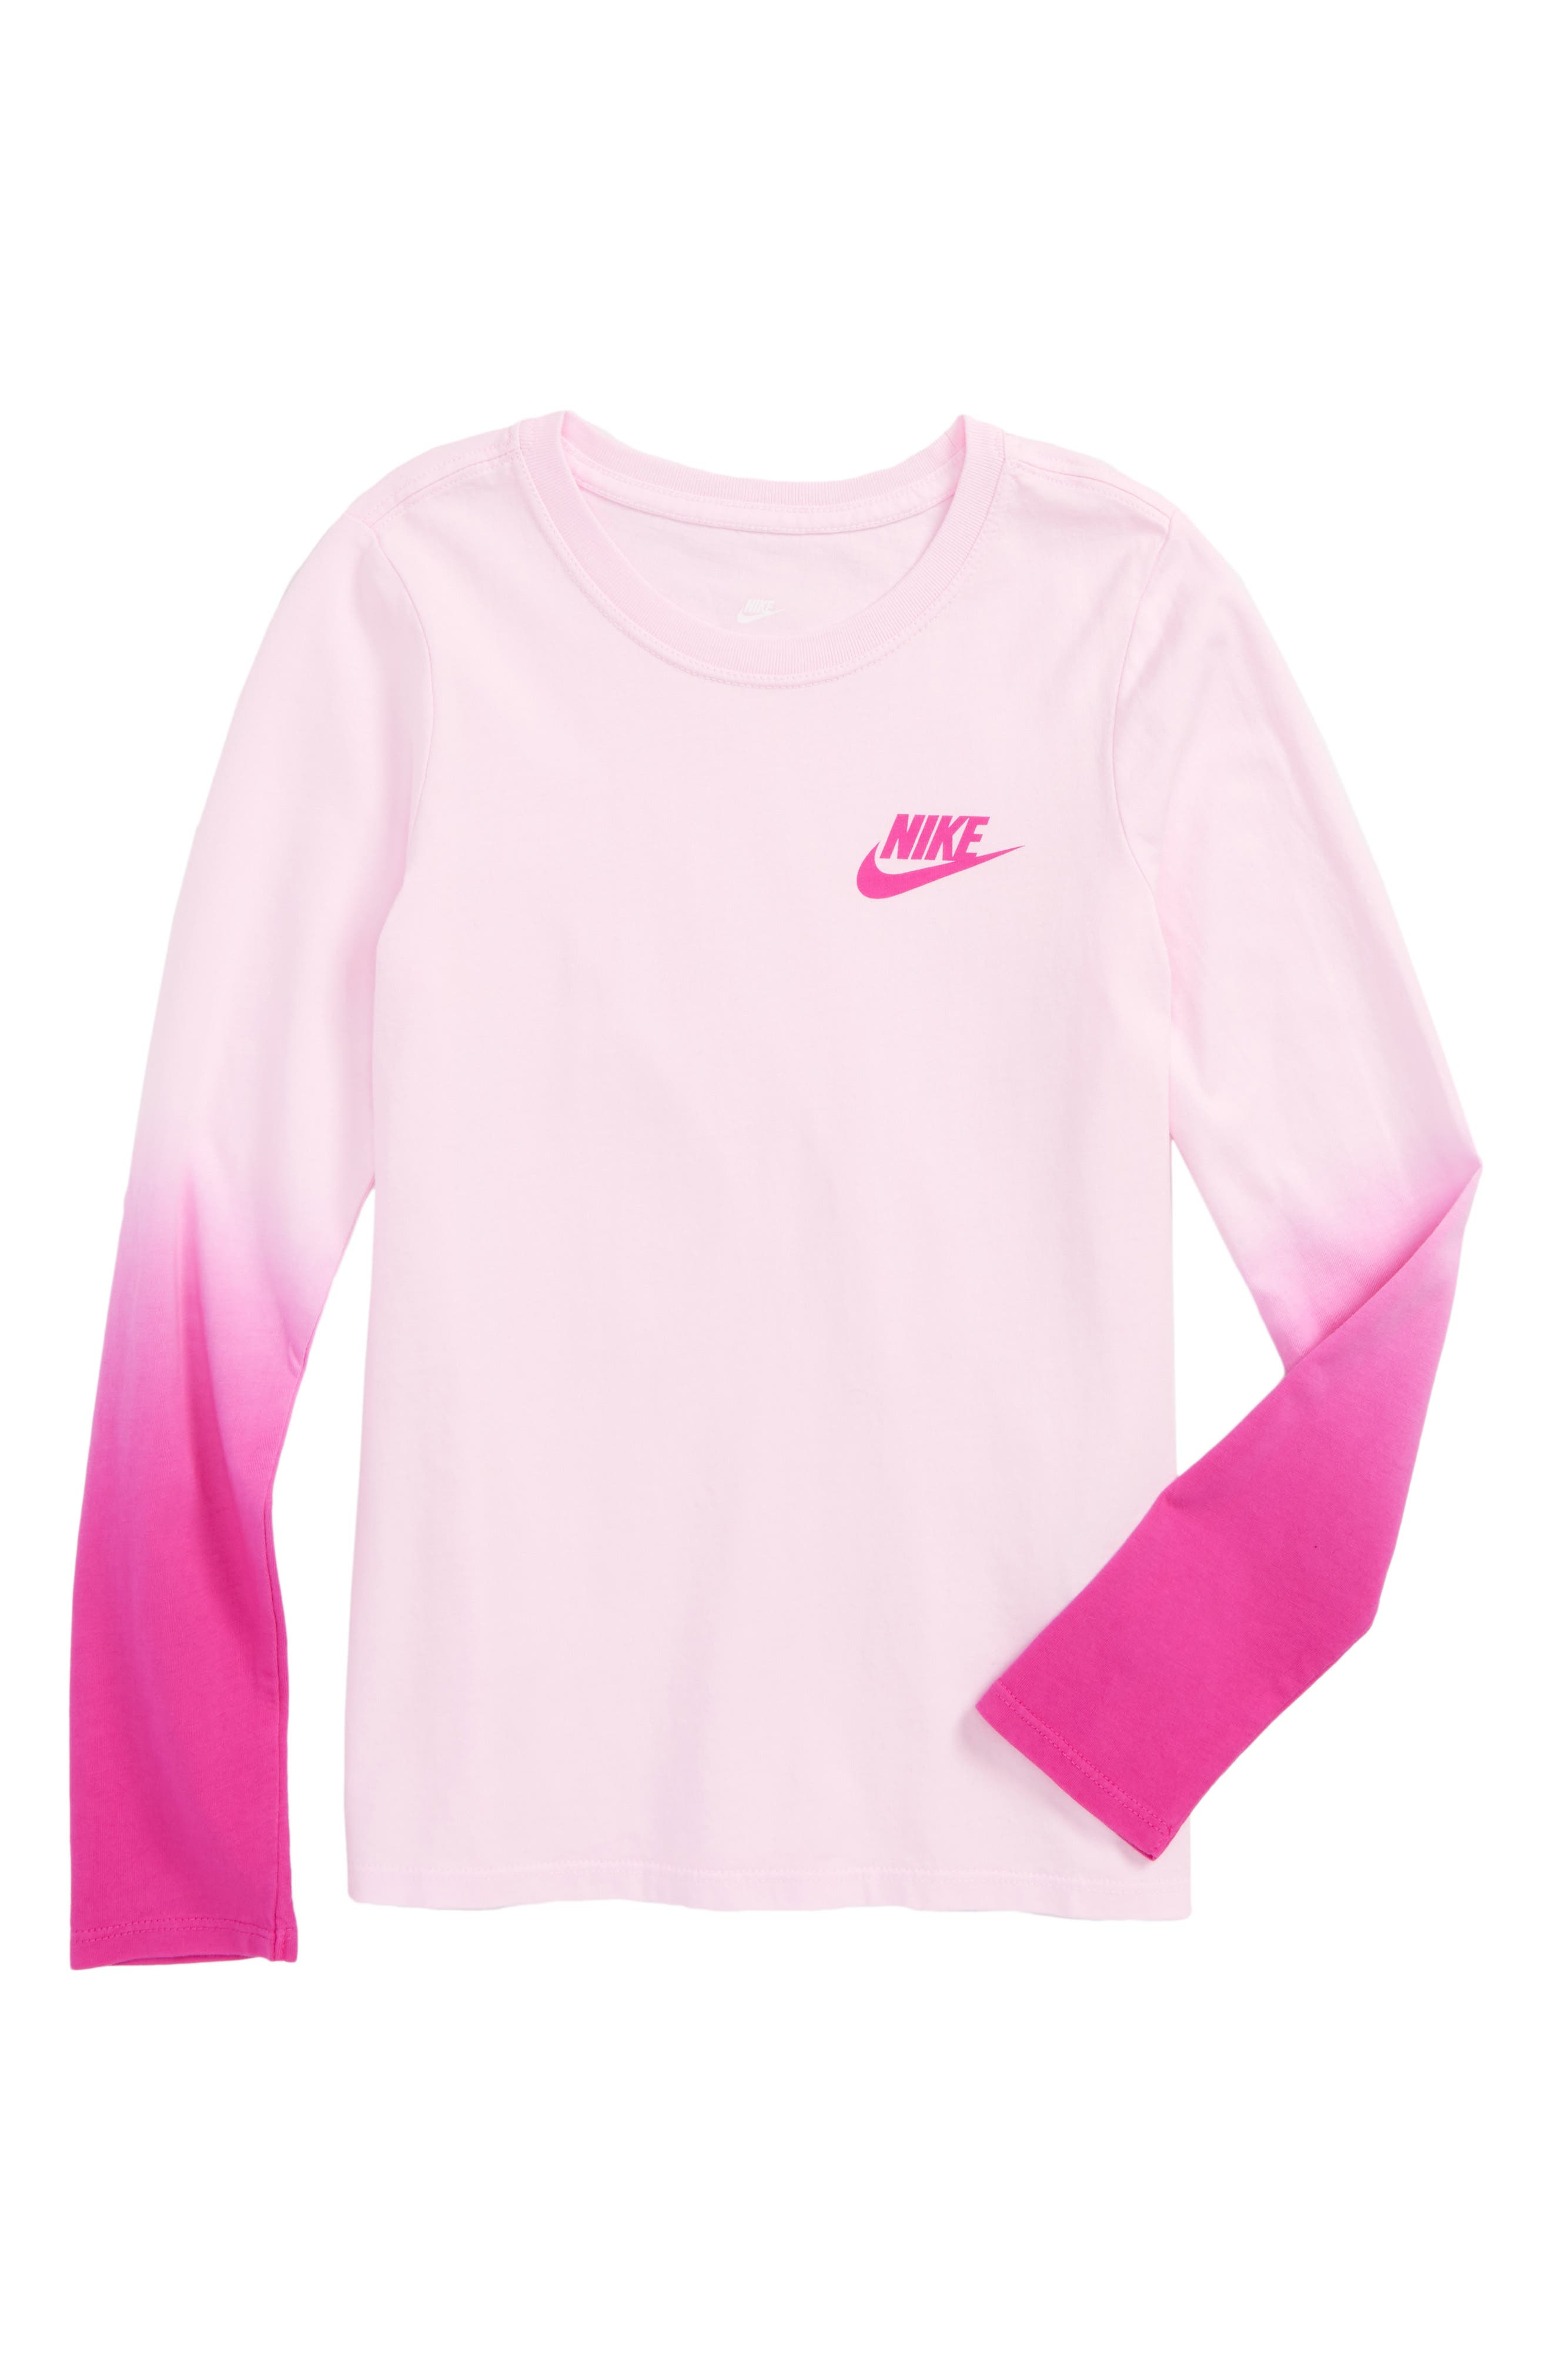 Alternate Image 1 Selected - Nike Dip Dye Tee (Big Girls)